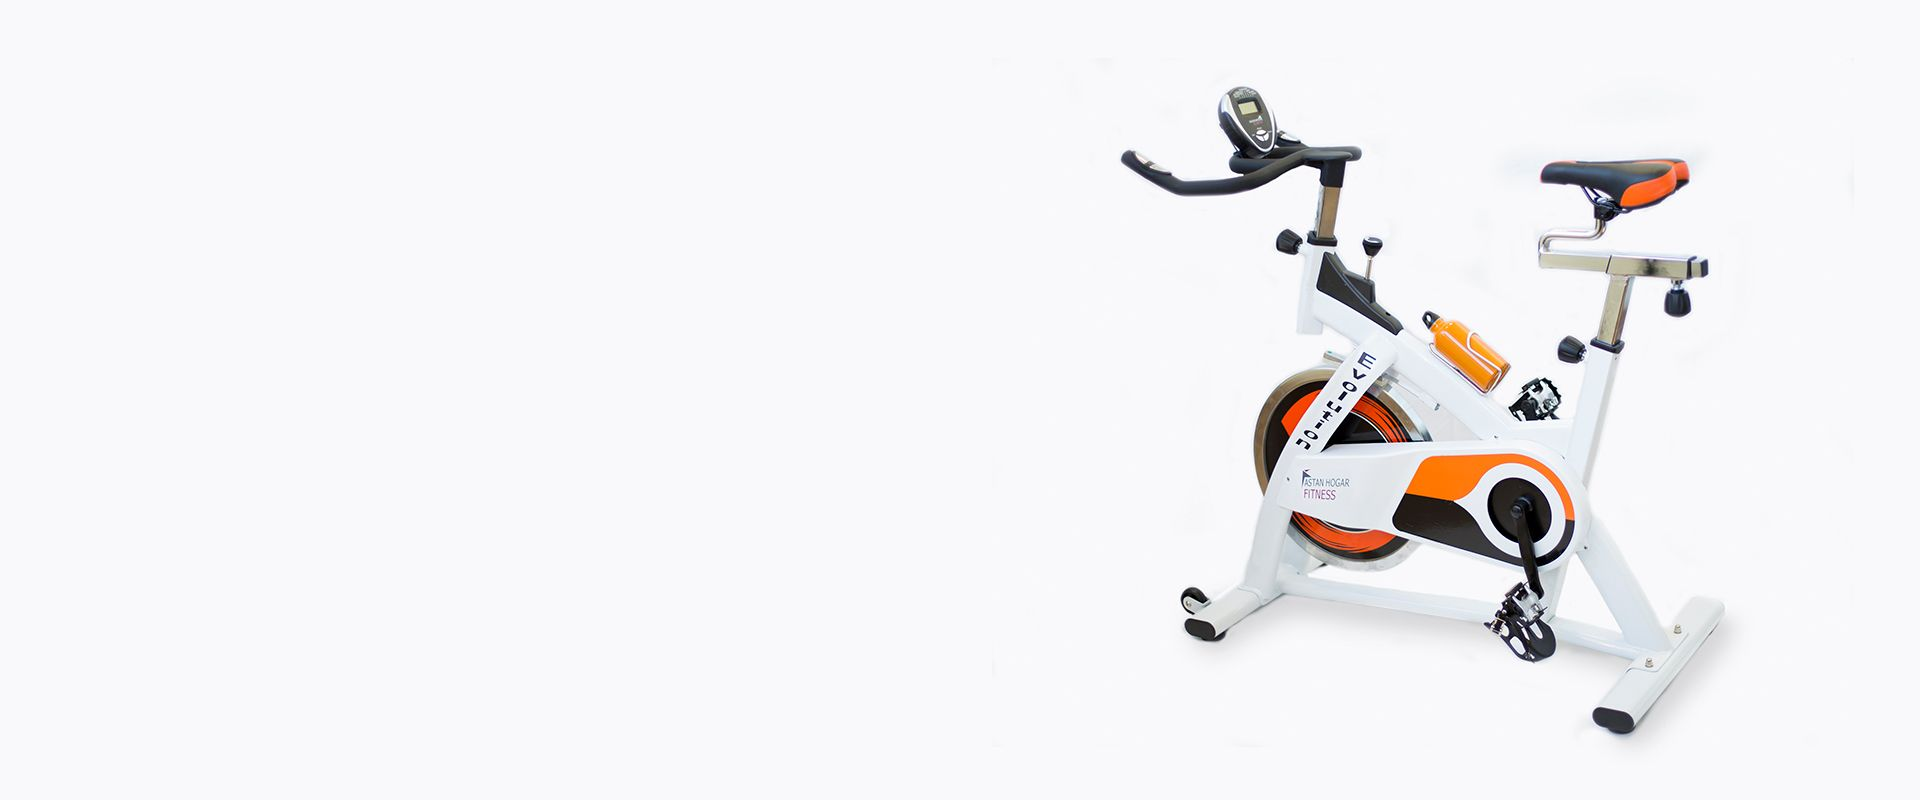 Bicicletas Estáticas Ciccly 1